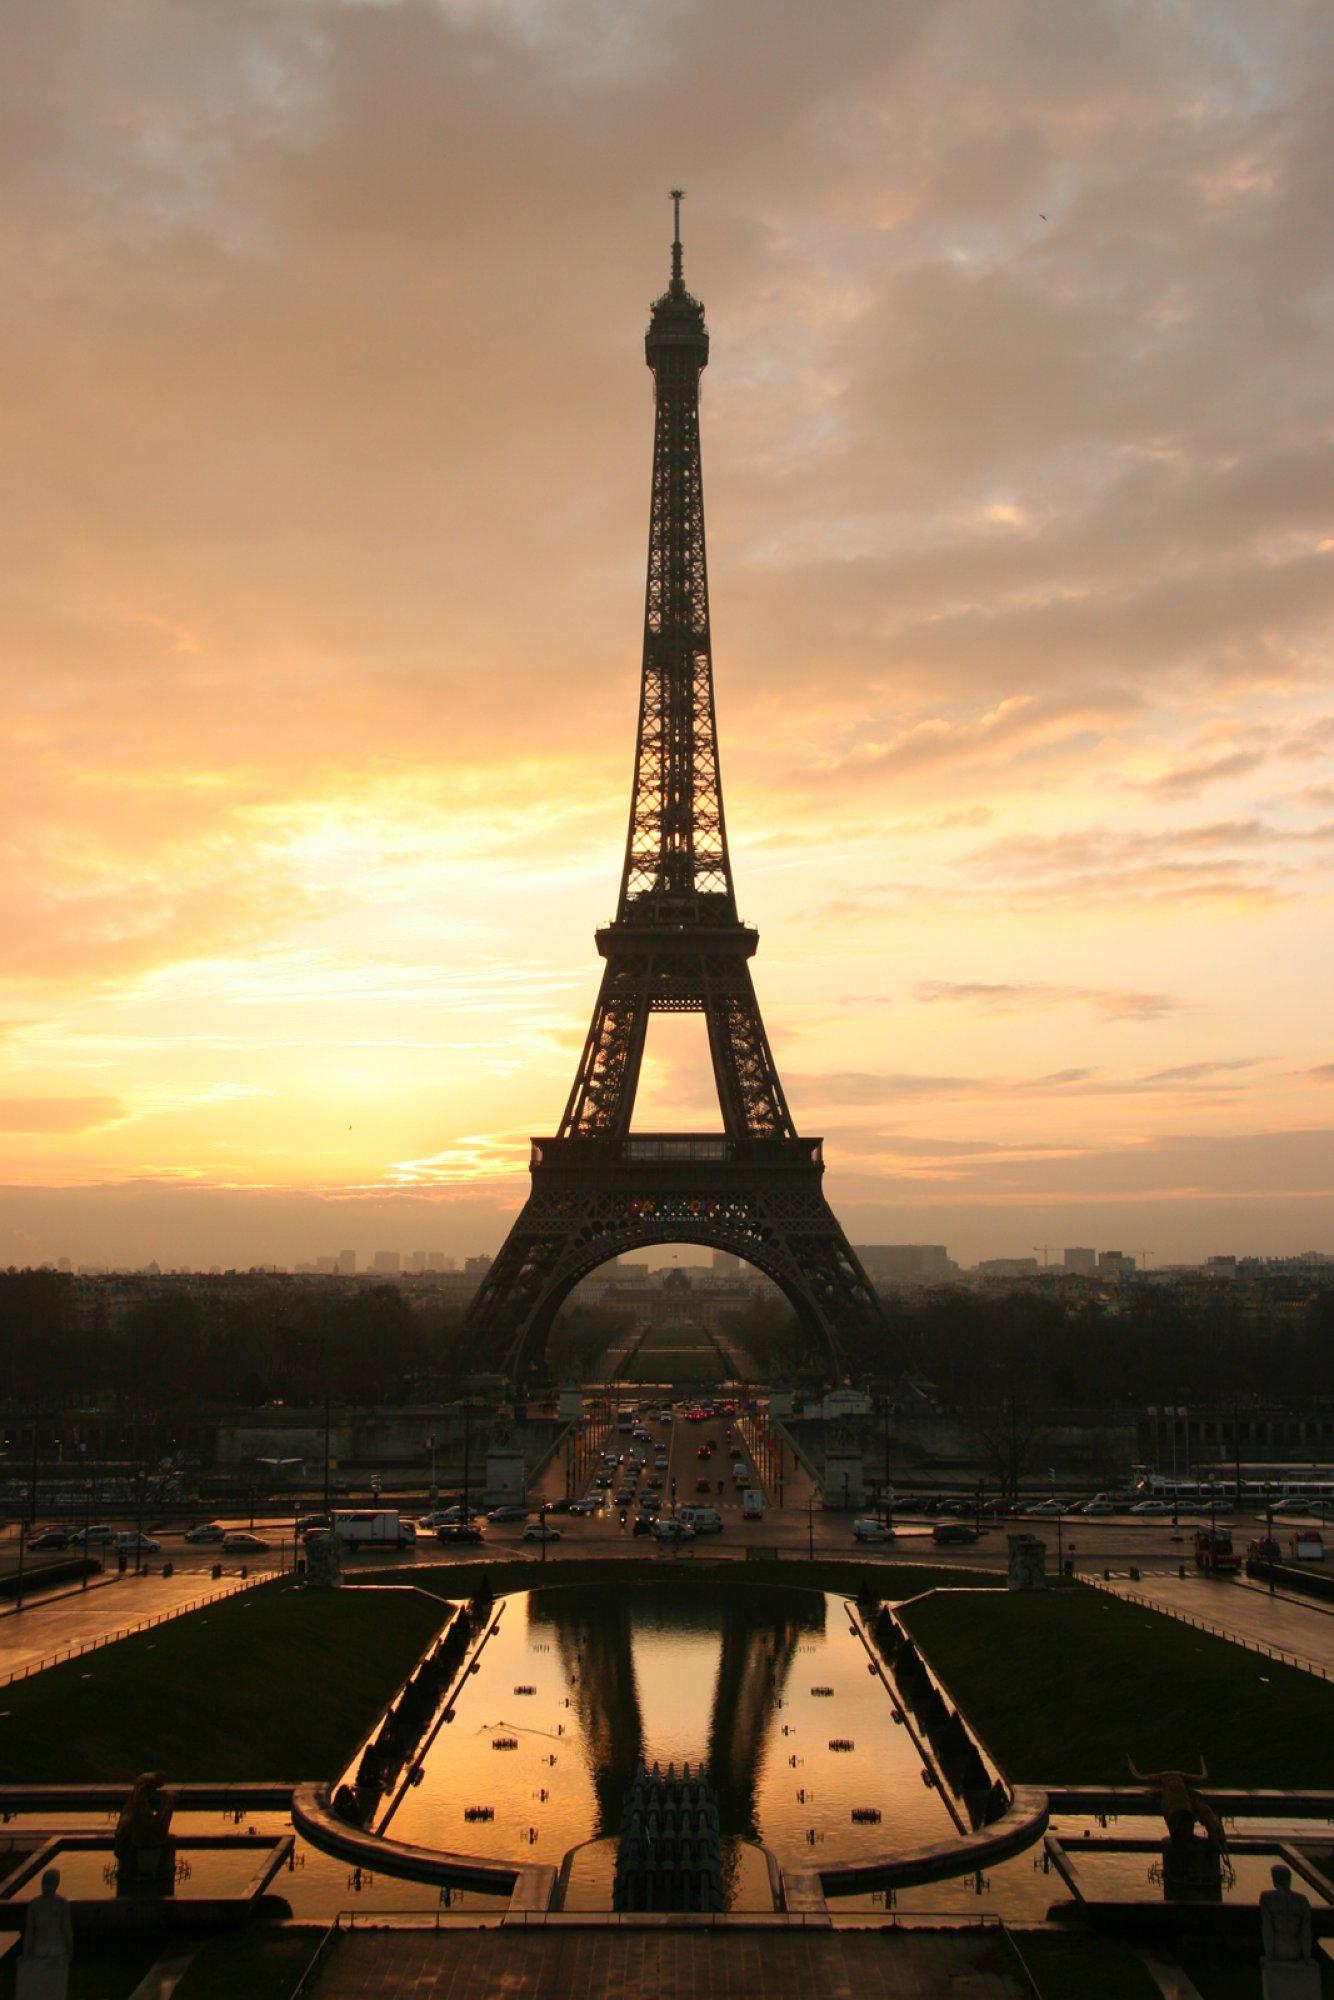 https://bubo.sk/uploads/galleries/7350/wikipedia-tour-eiffel-at-sunrise-from-the-trocadero.jpg